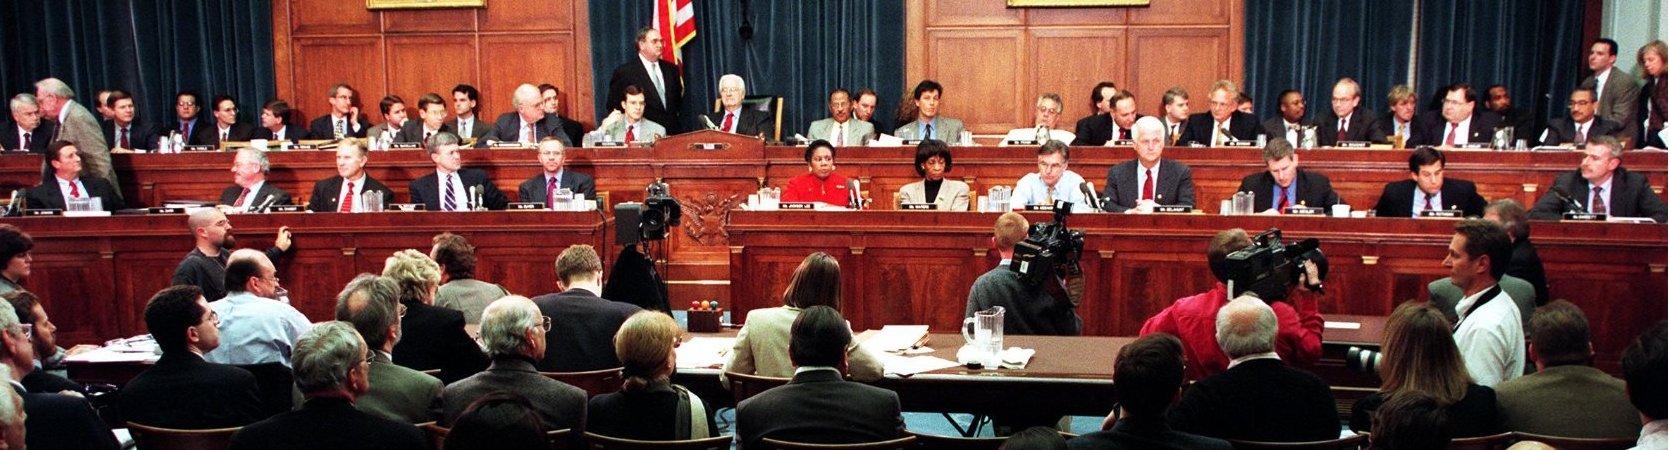 Impeachment a Bill Clinton